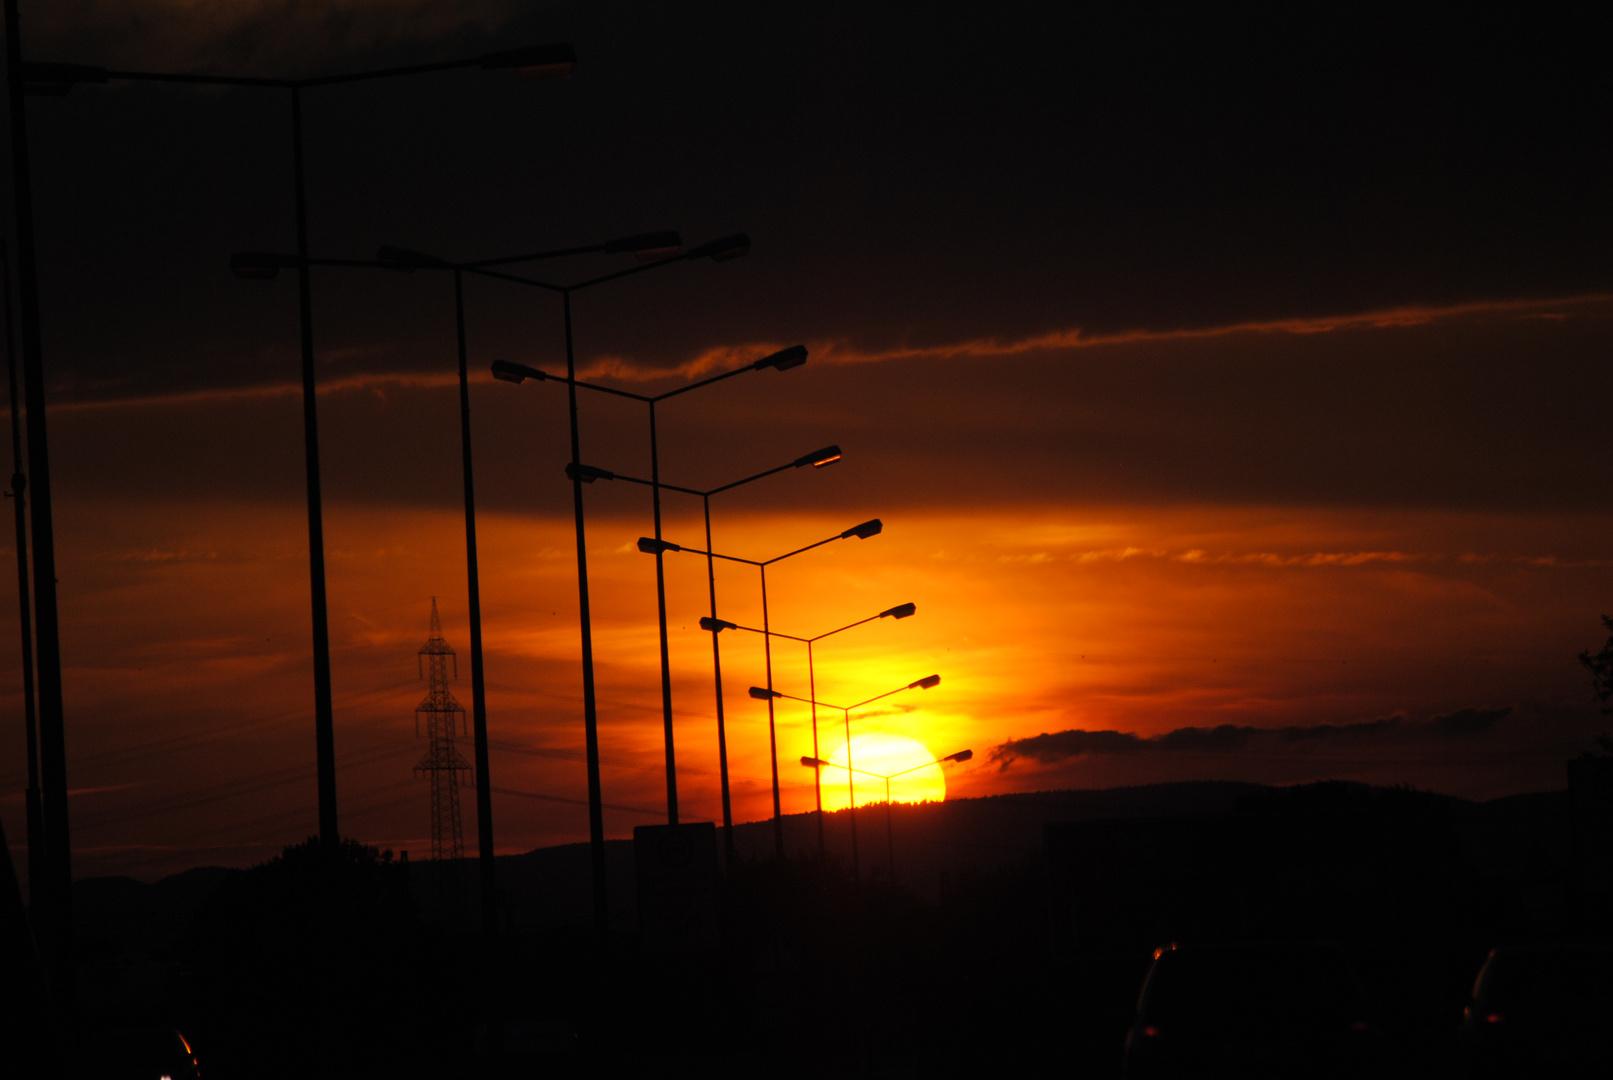 Sonnenuntergang auf Rheinbrücke Karlsruhe